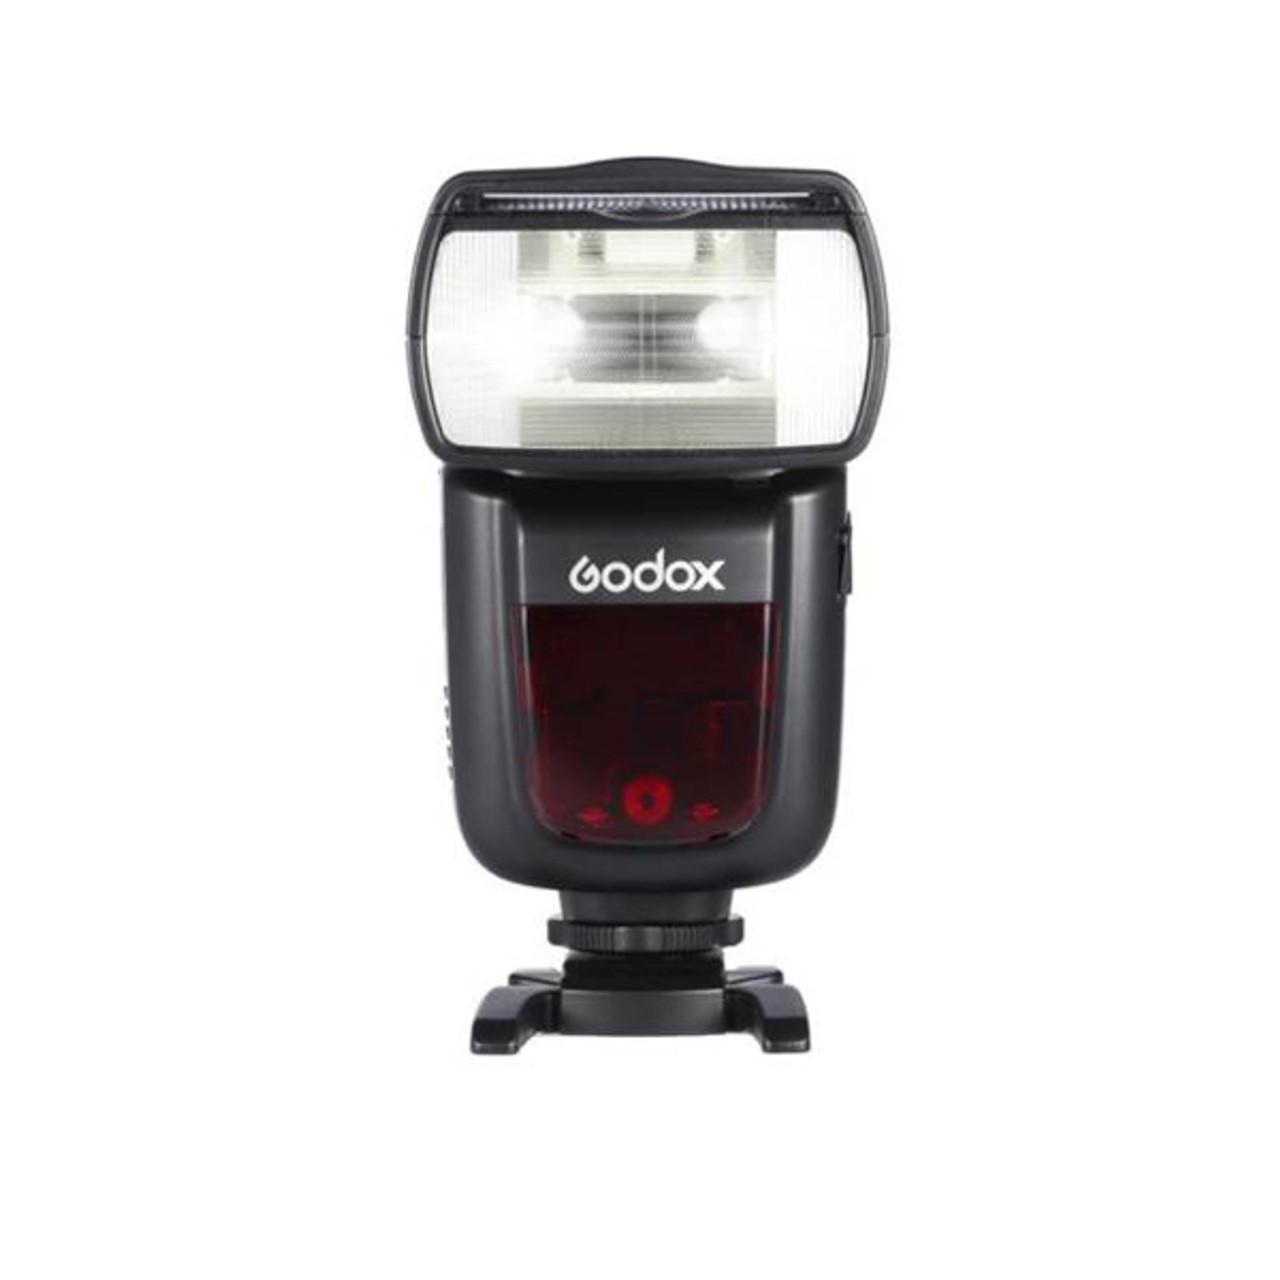 Godox V860II Flash for Fujifilm